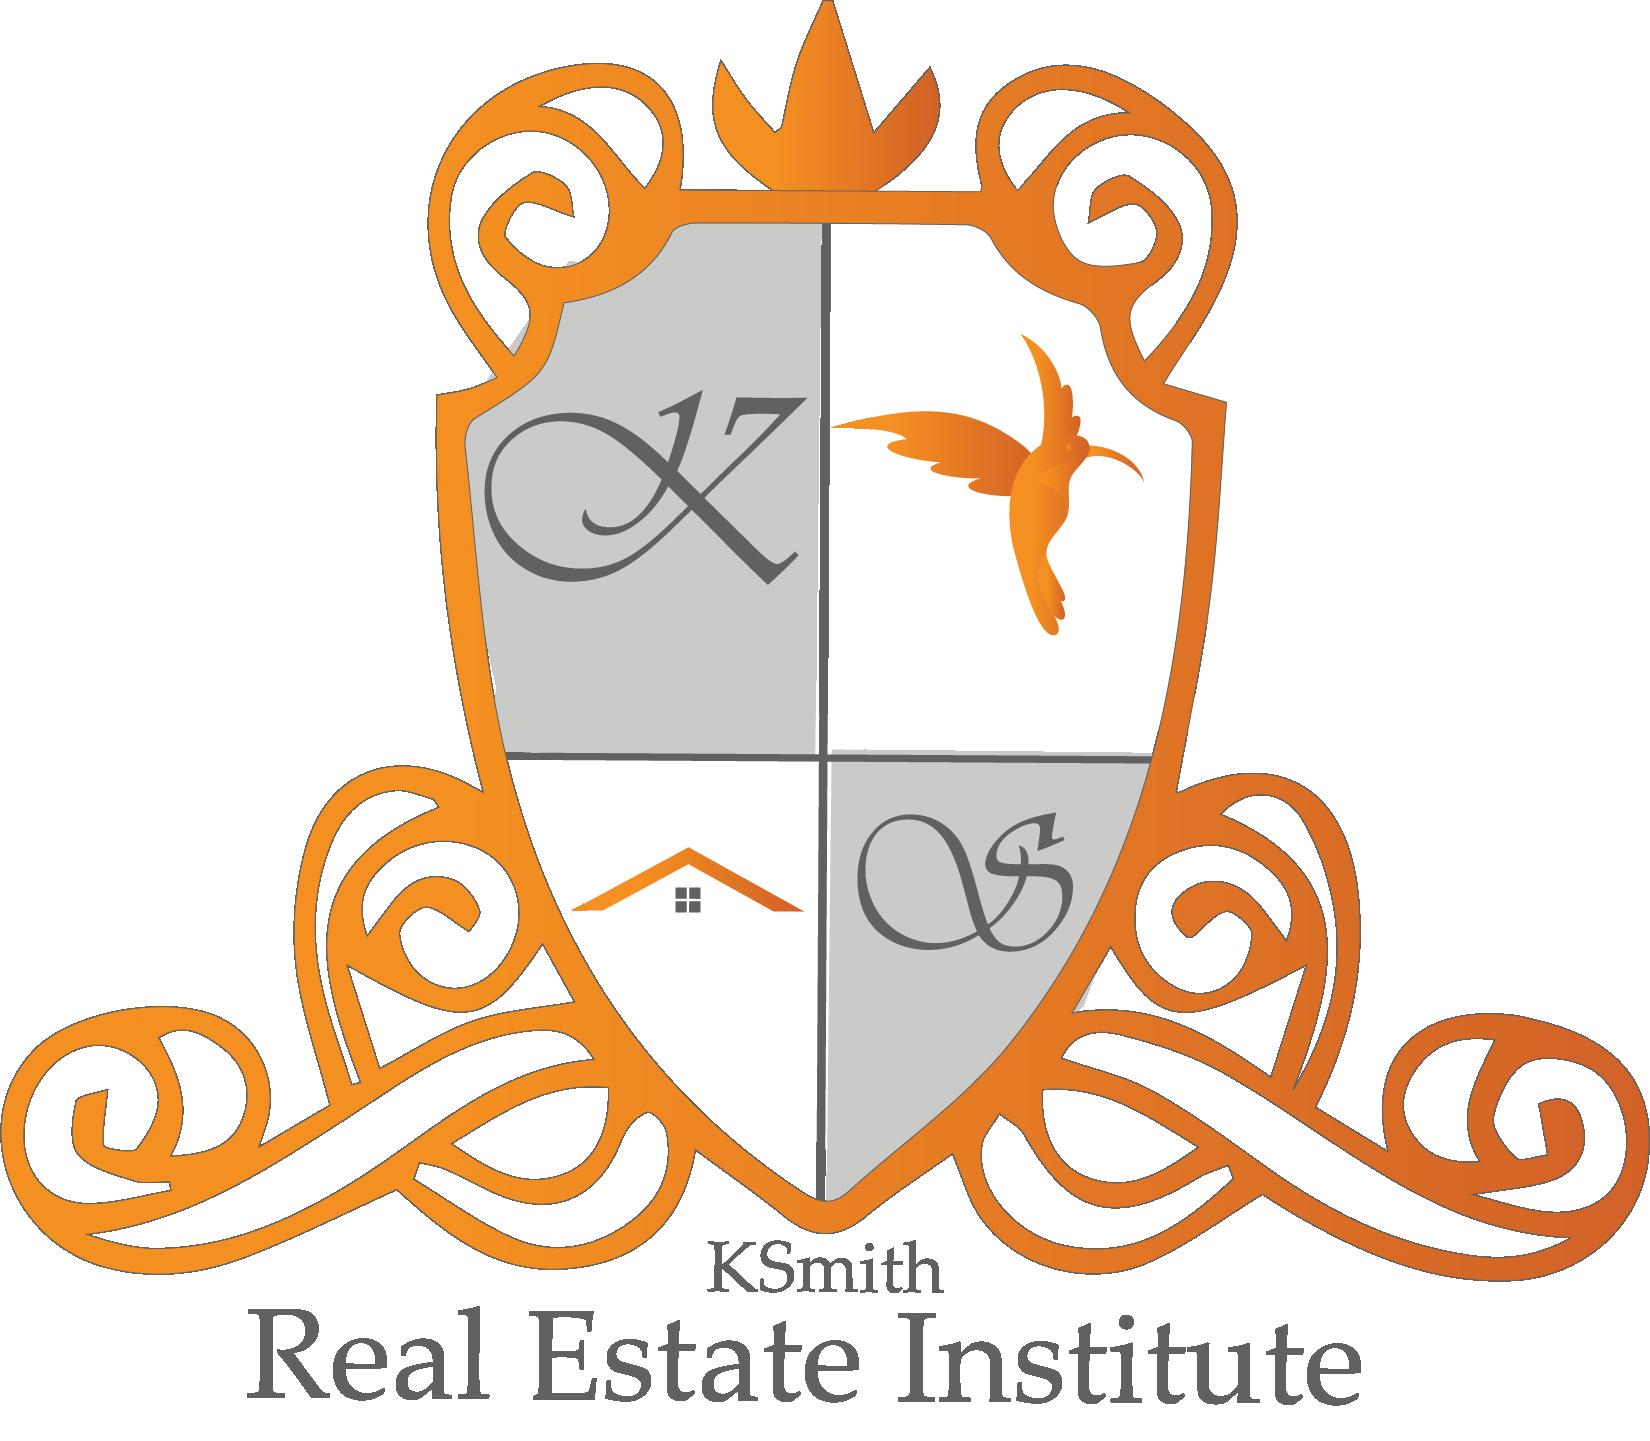 KSmith Real Estate Institute Logo Shield